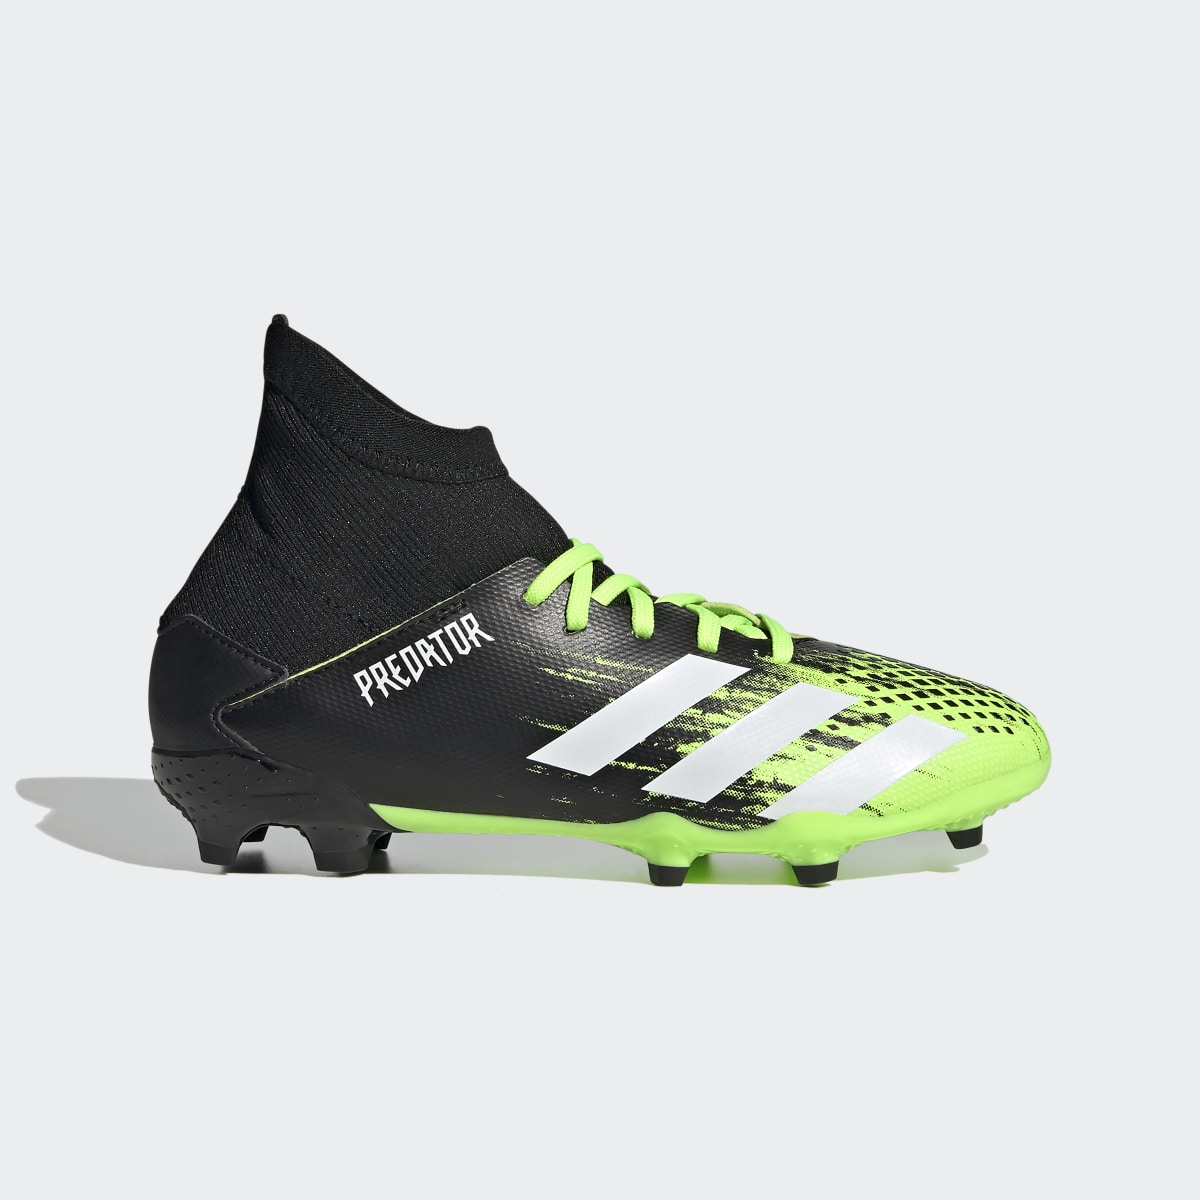 Predator Mutator 20.3 Firm Ground Boots